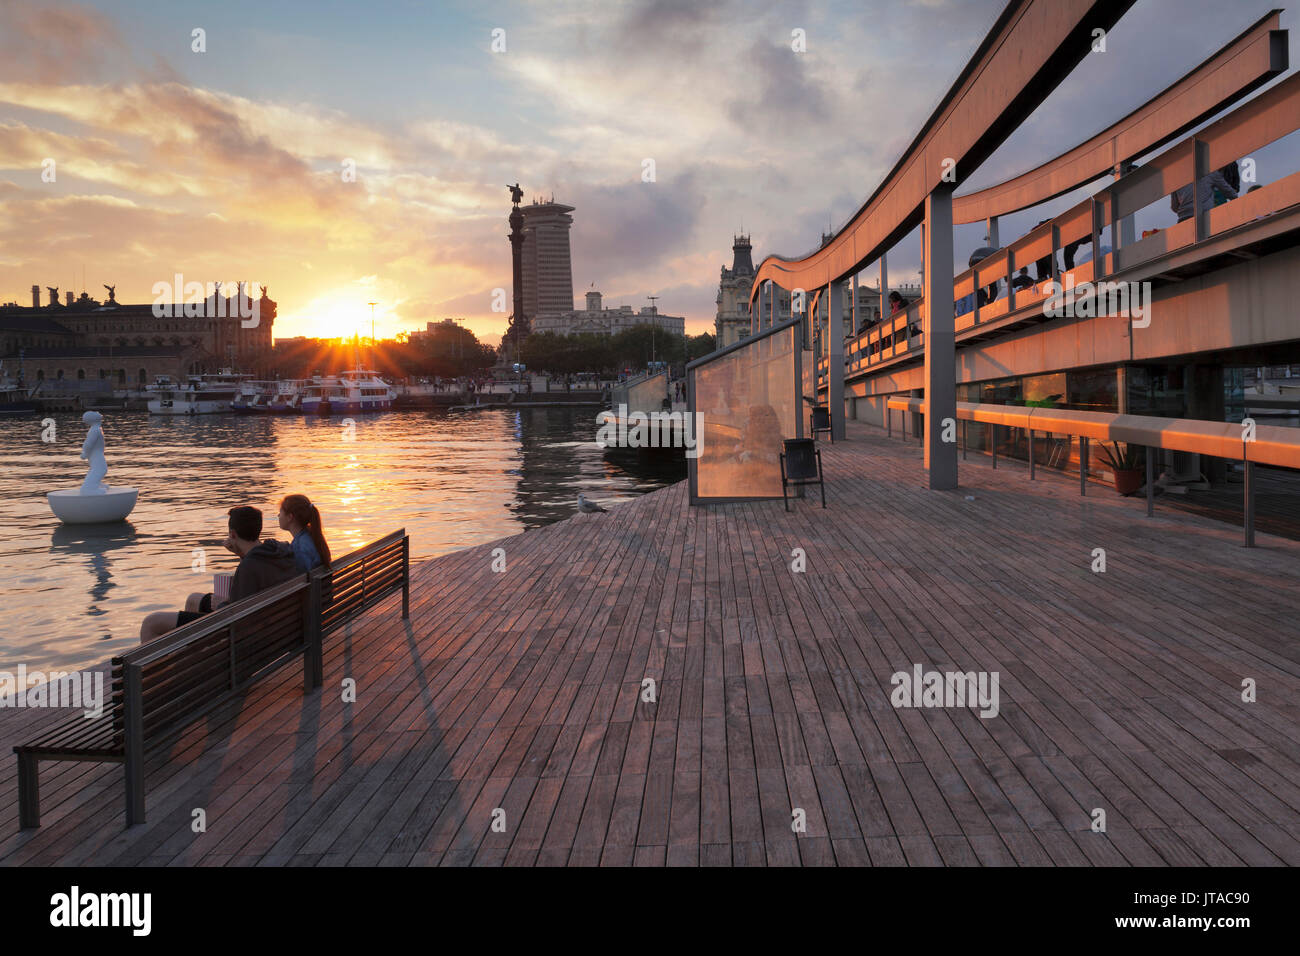 Rambla del Mar à Port Vell, Edificio Colon Tour et monument de Christophe Colomb (Monument a Colom), Barcelone, Catalogne, Espagne, Europe Photo Stock